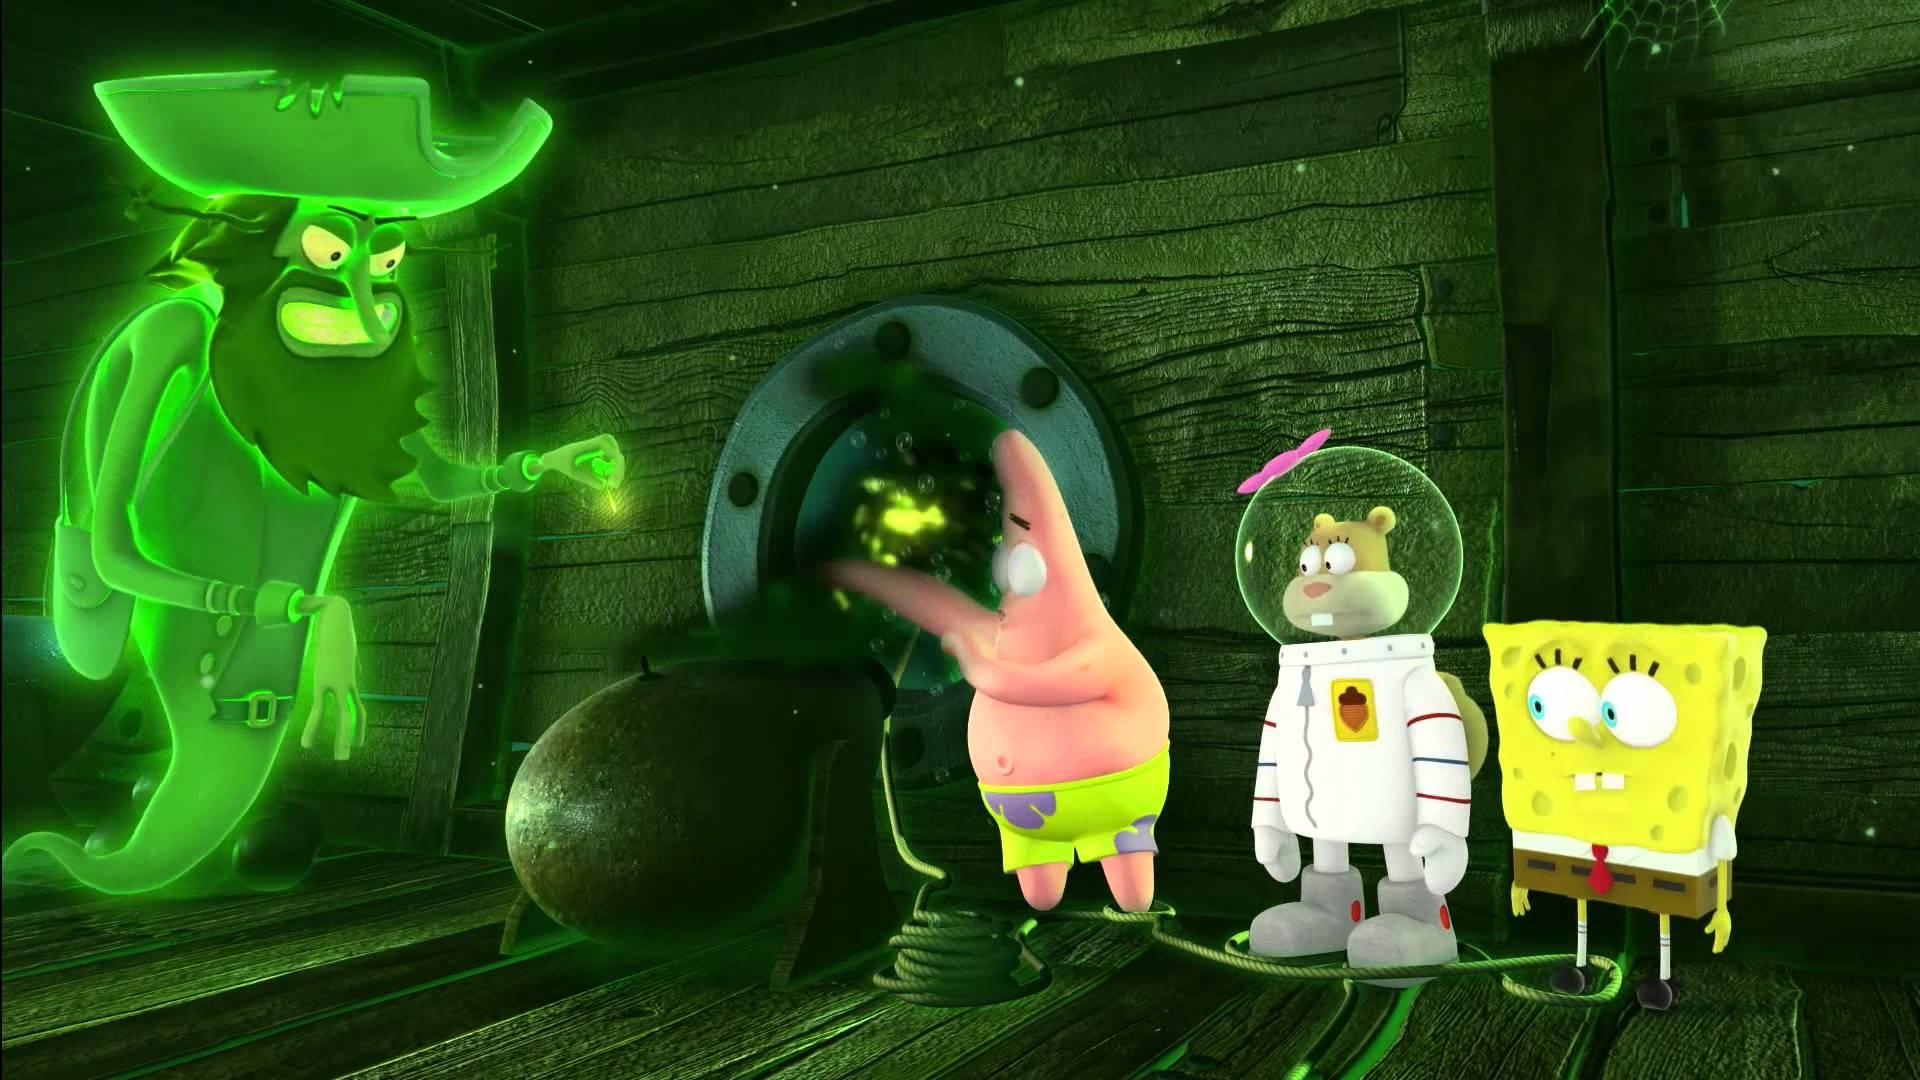 image - spongebob 3d | seaworld gold coast australia wikia